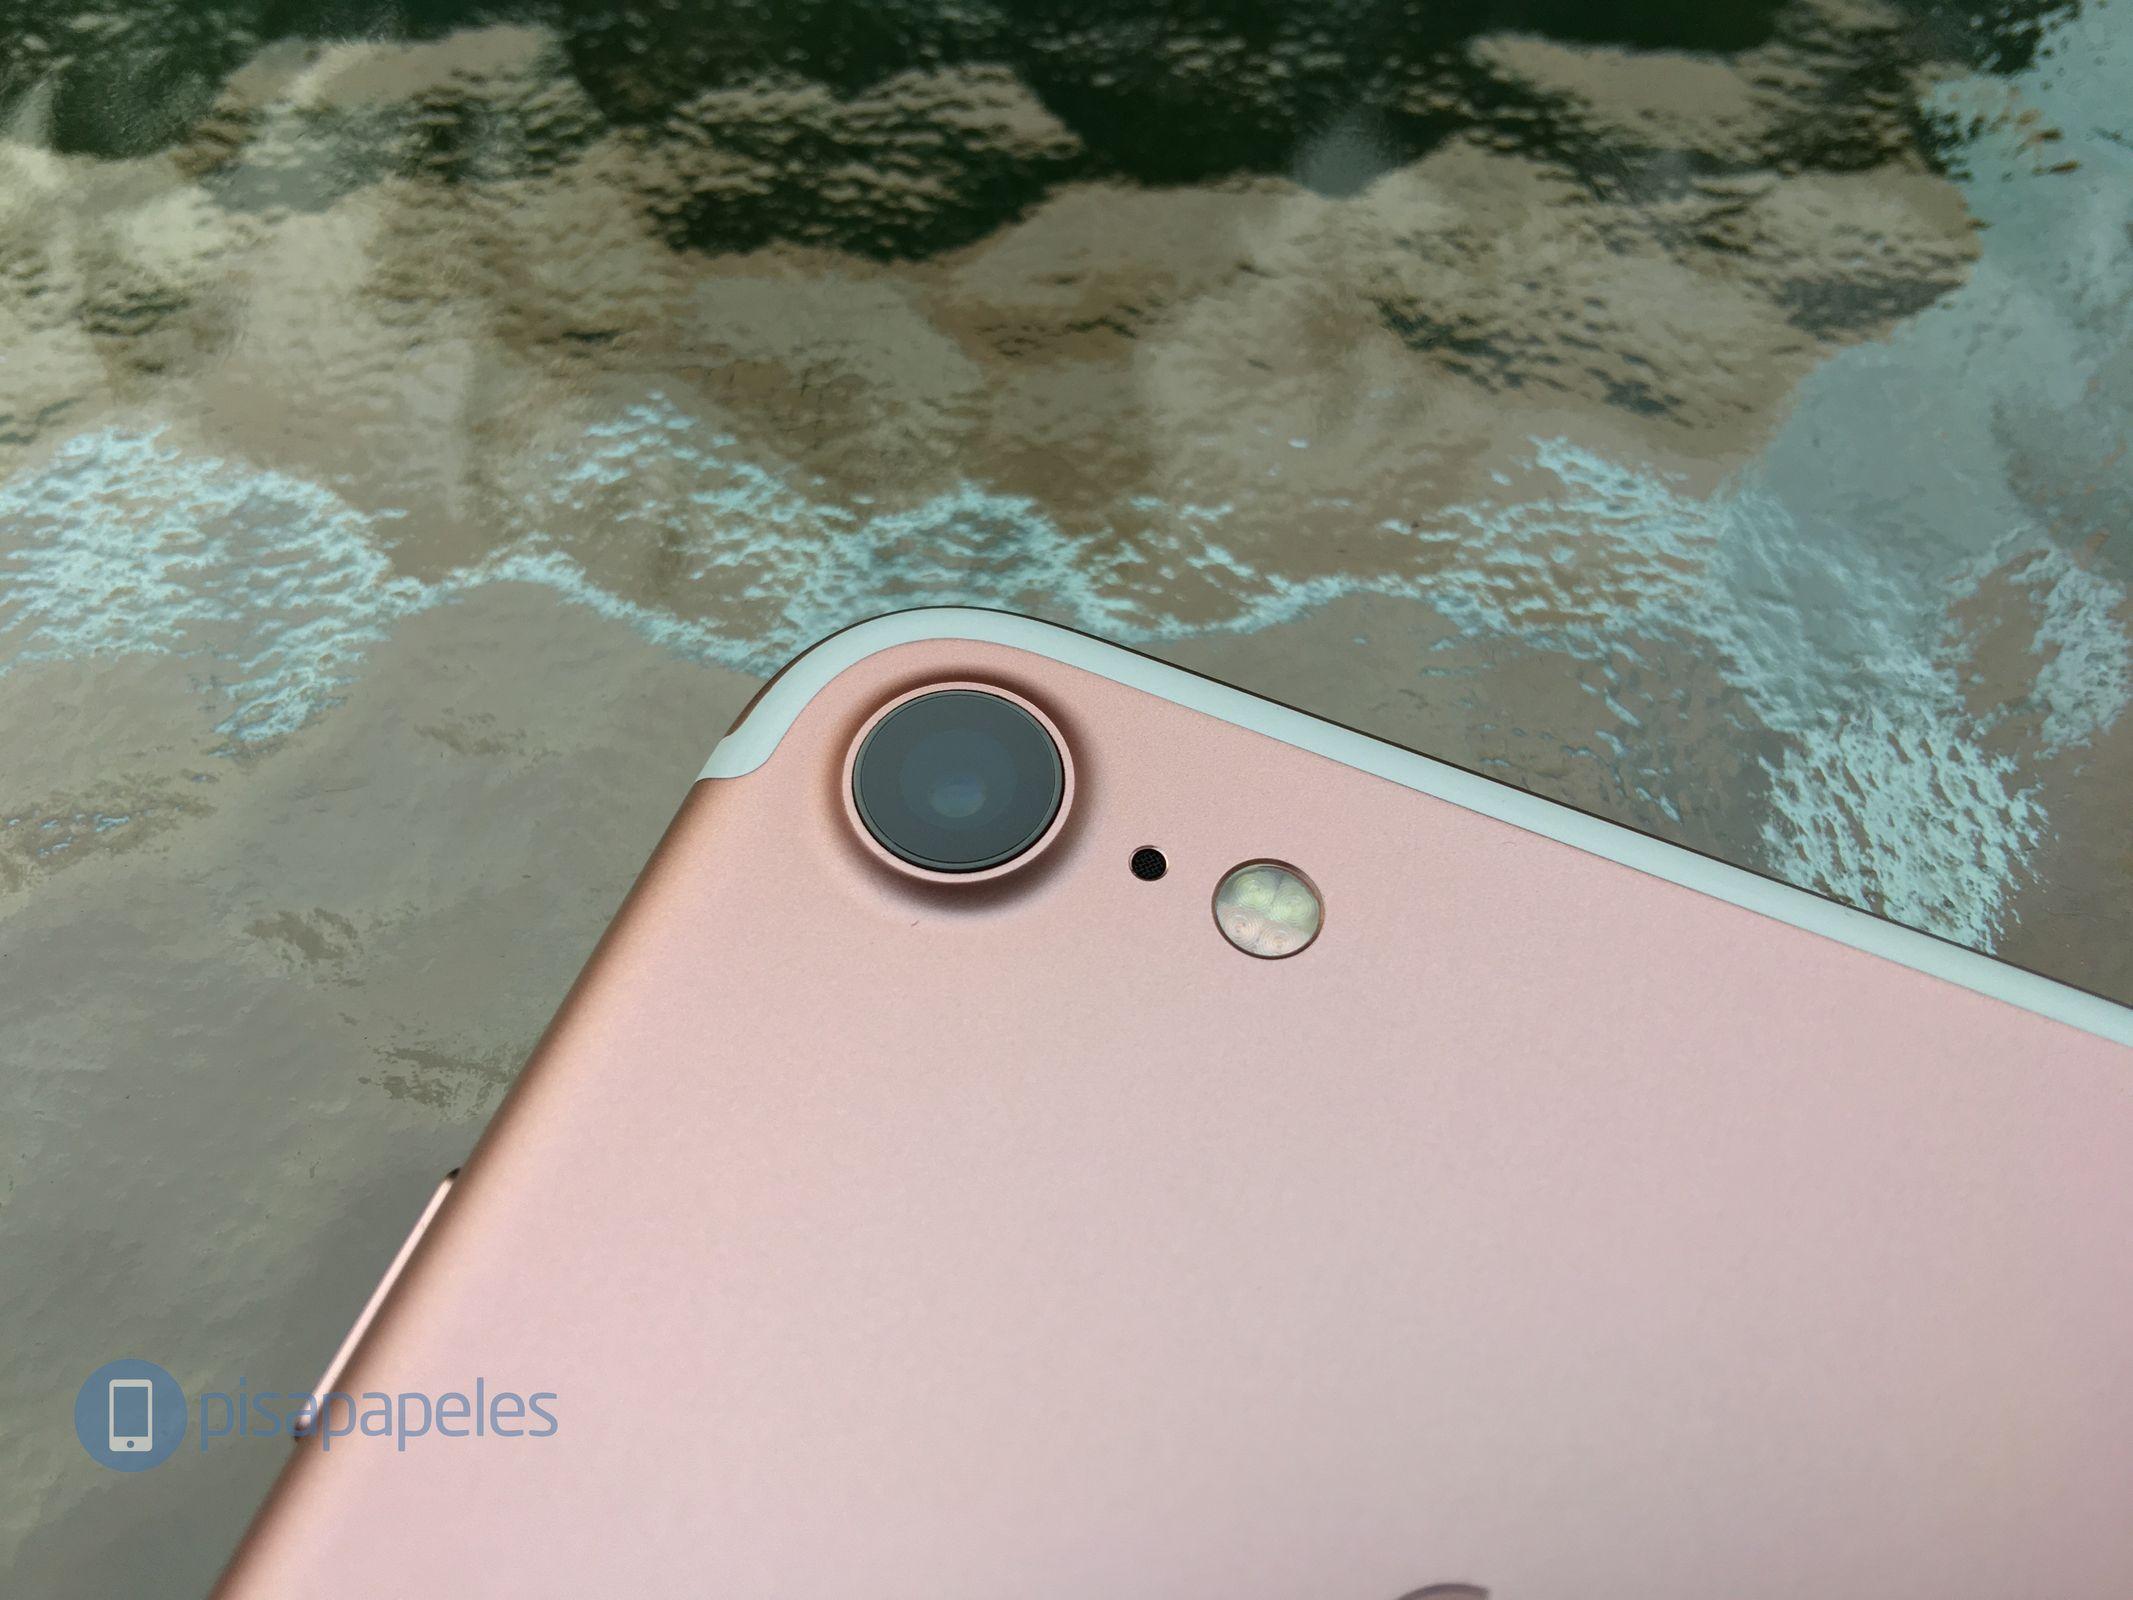 apple-iphone-7-pisapapeles-net_14